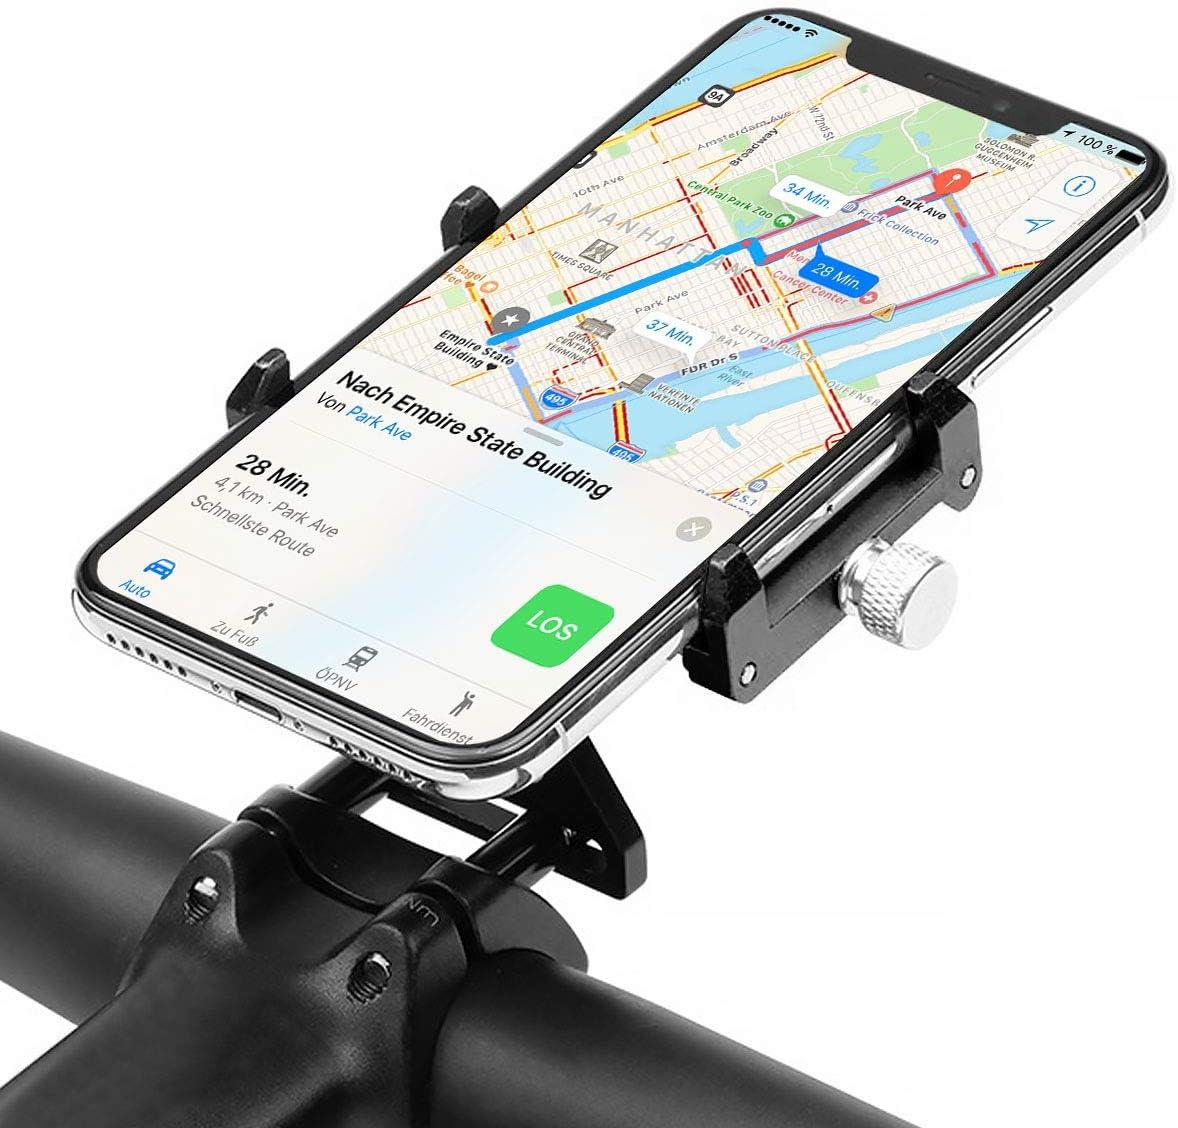 Gub Universal Bike Lenkervorbau Fahrrad Halterung Für Elektronik